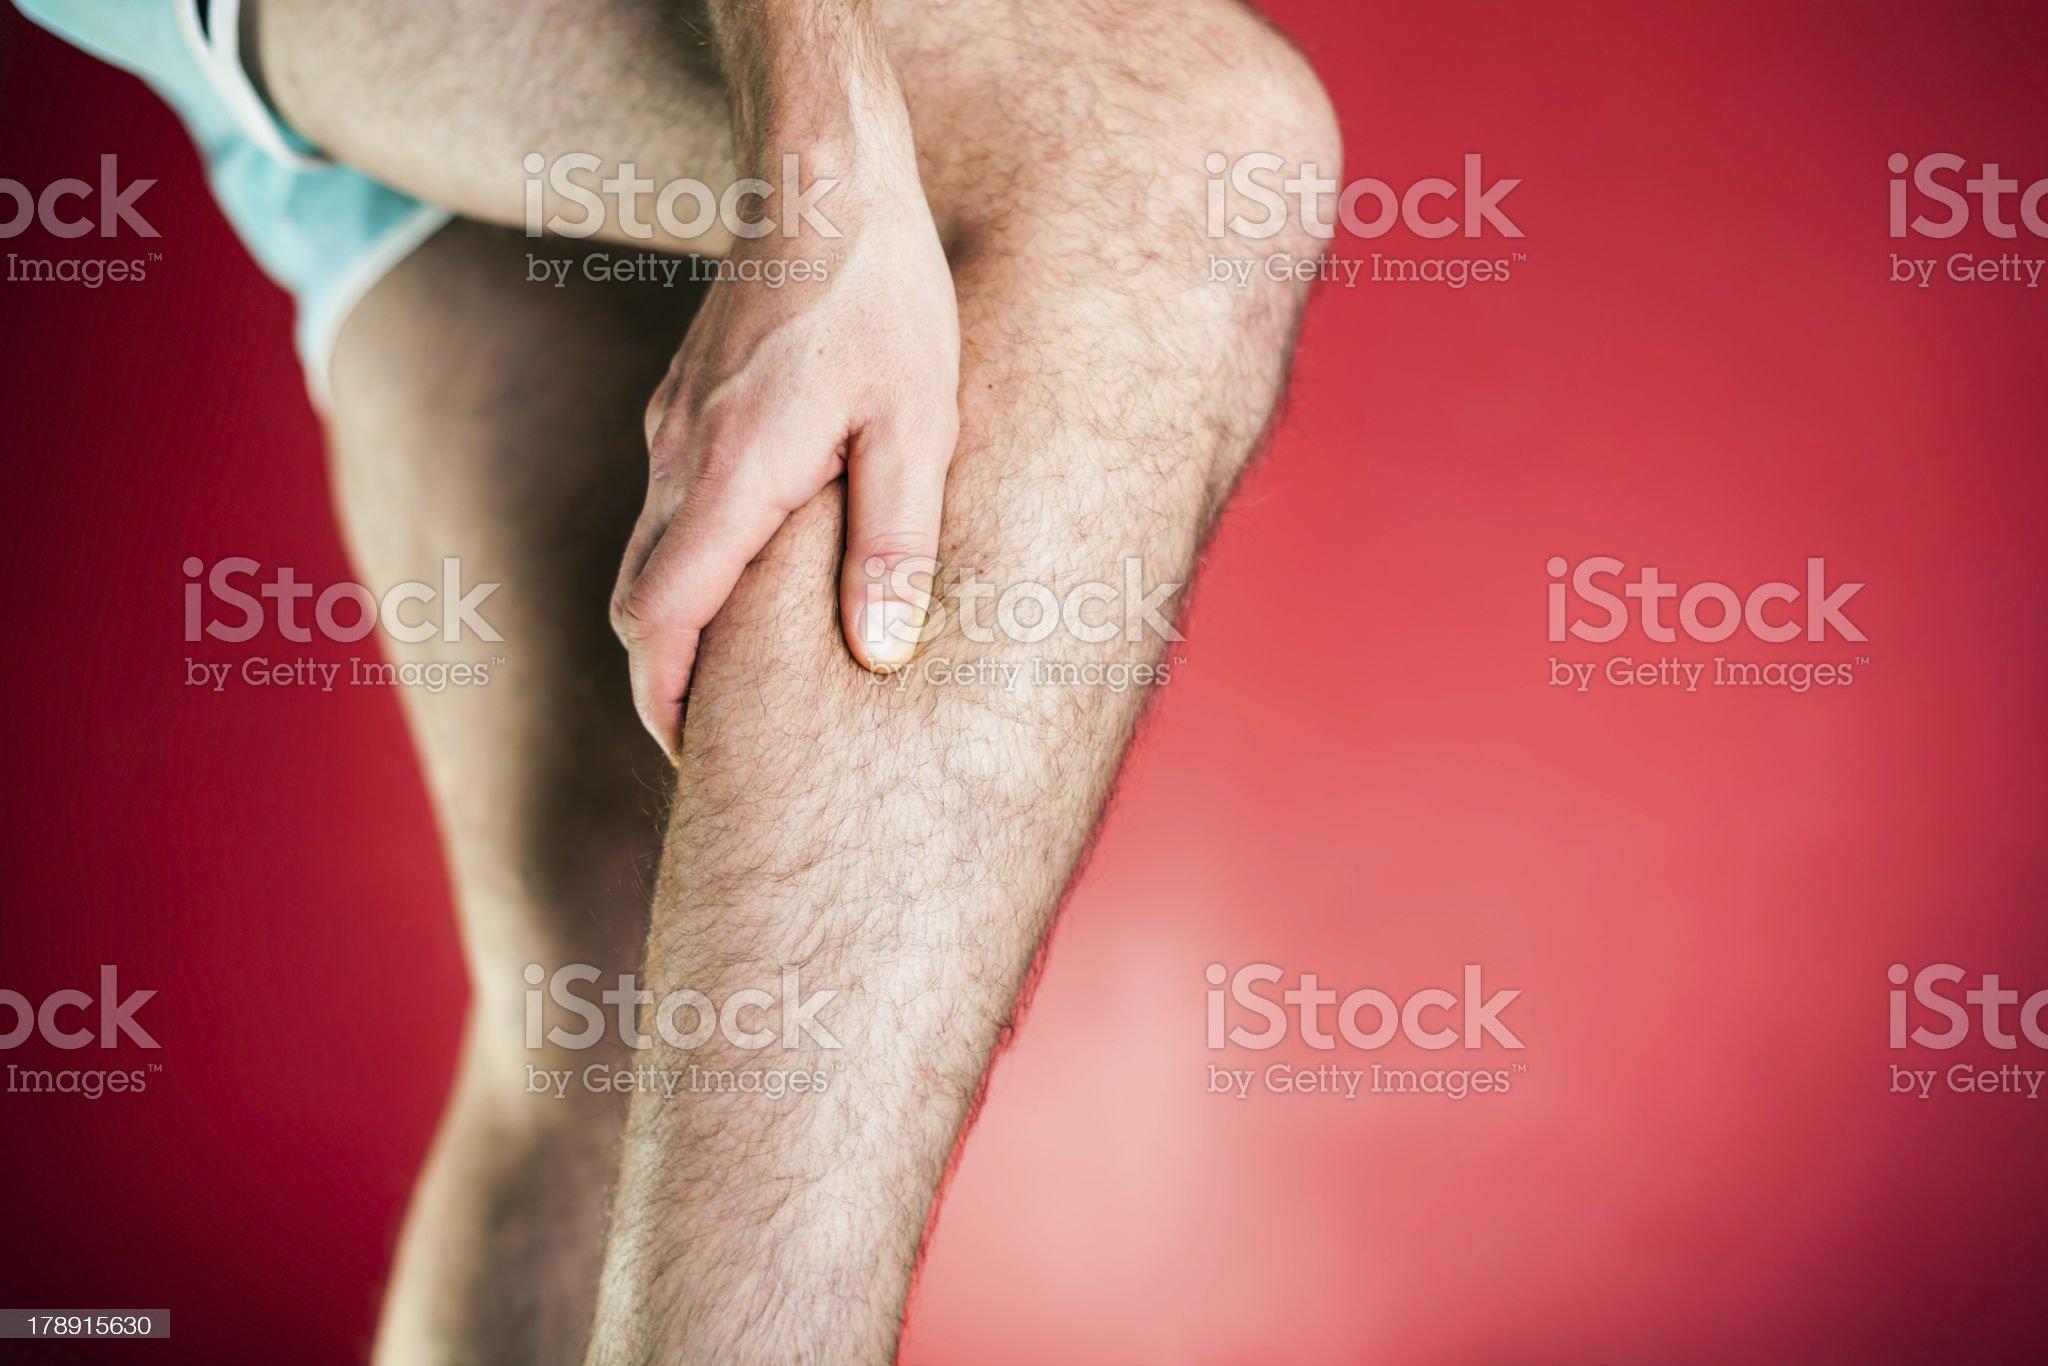 Running physical injury, leg pain XXXL royalty-free stock photo